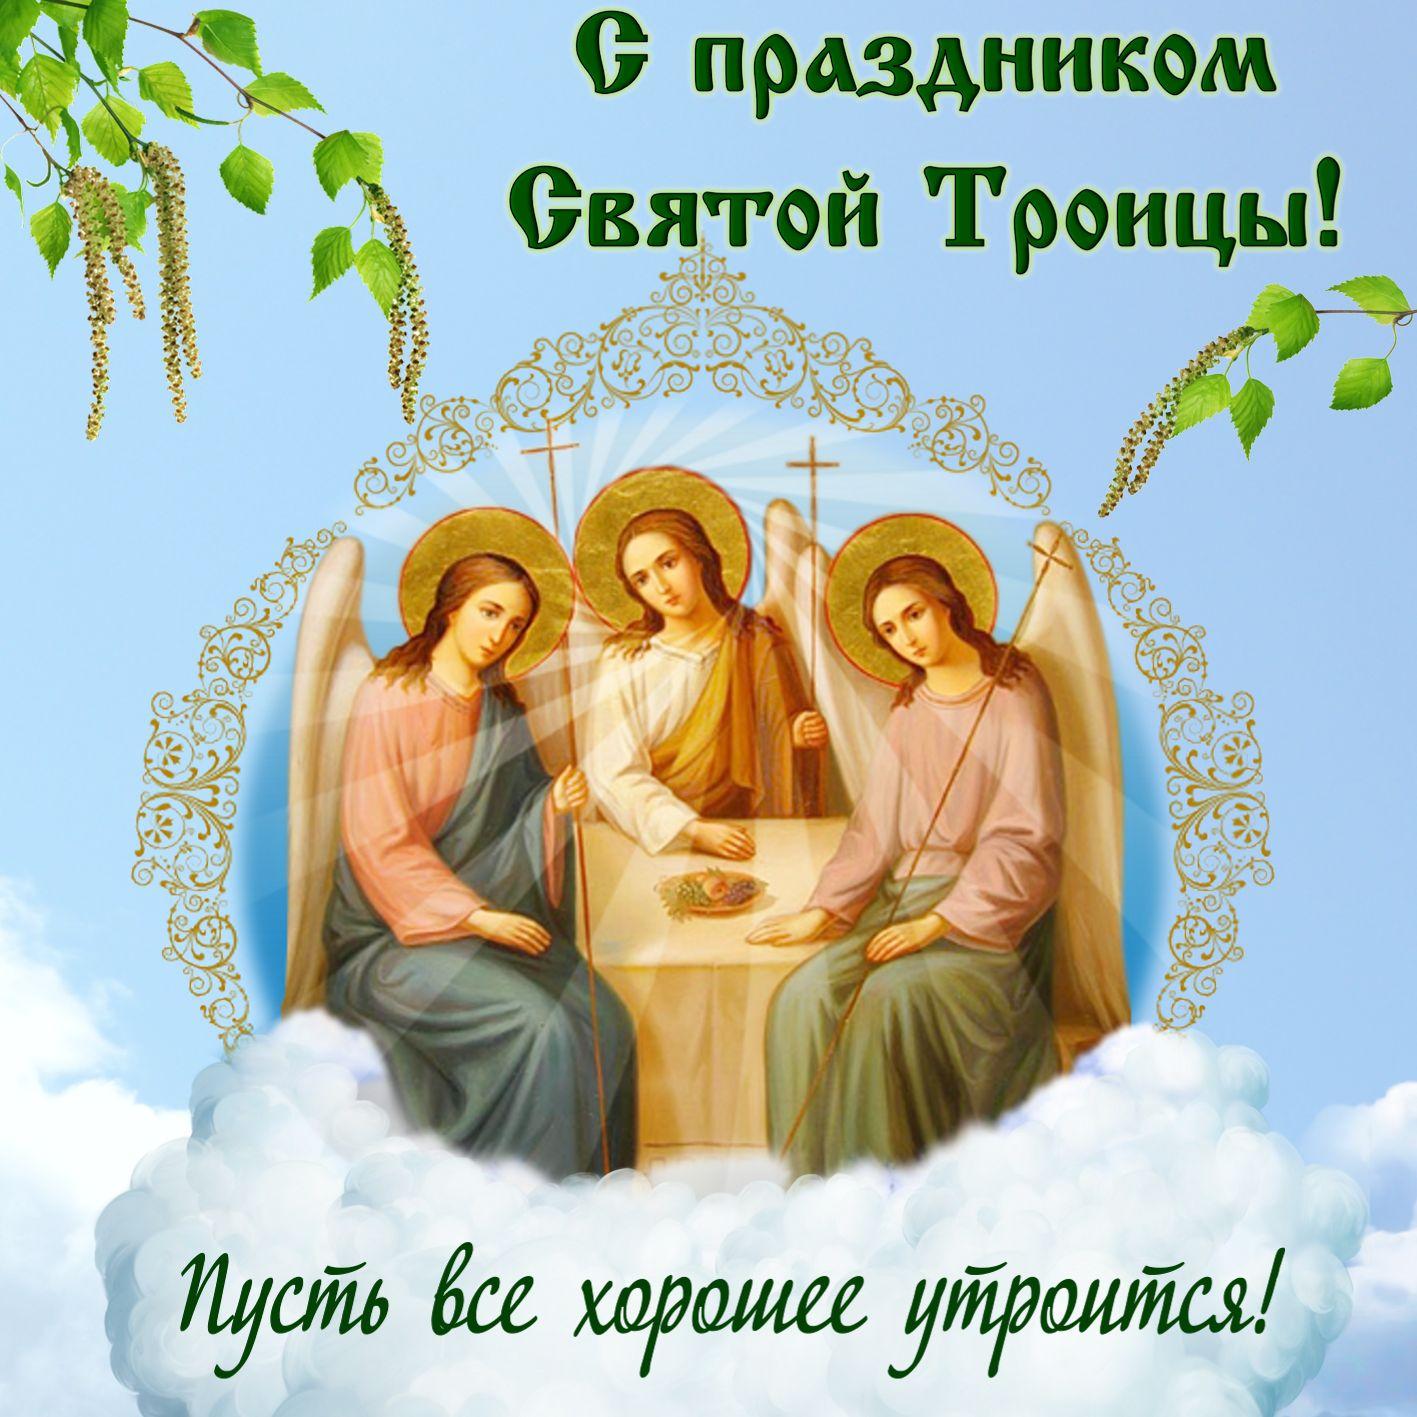 Открытка троицы 16 июня